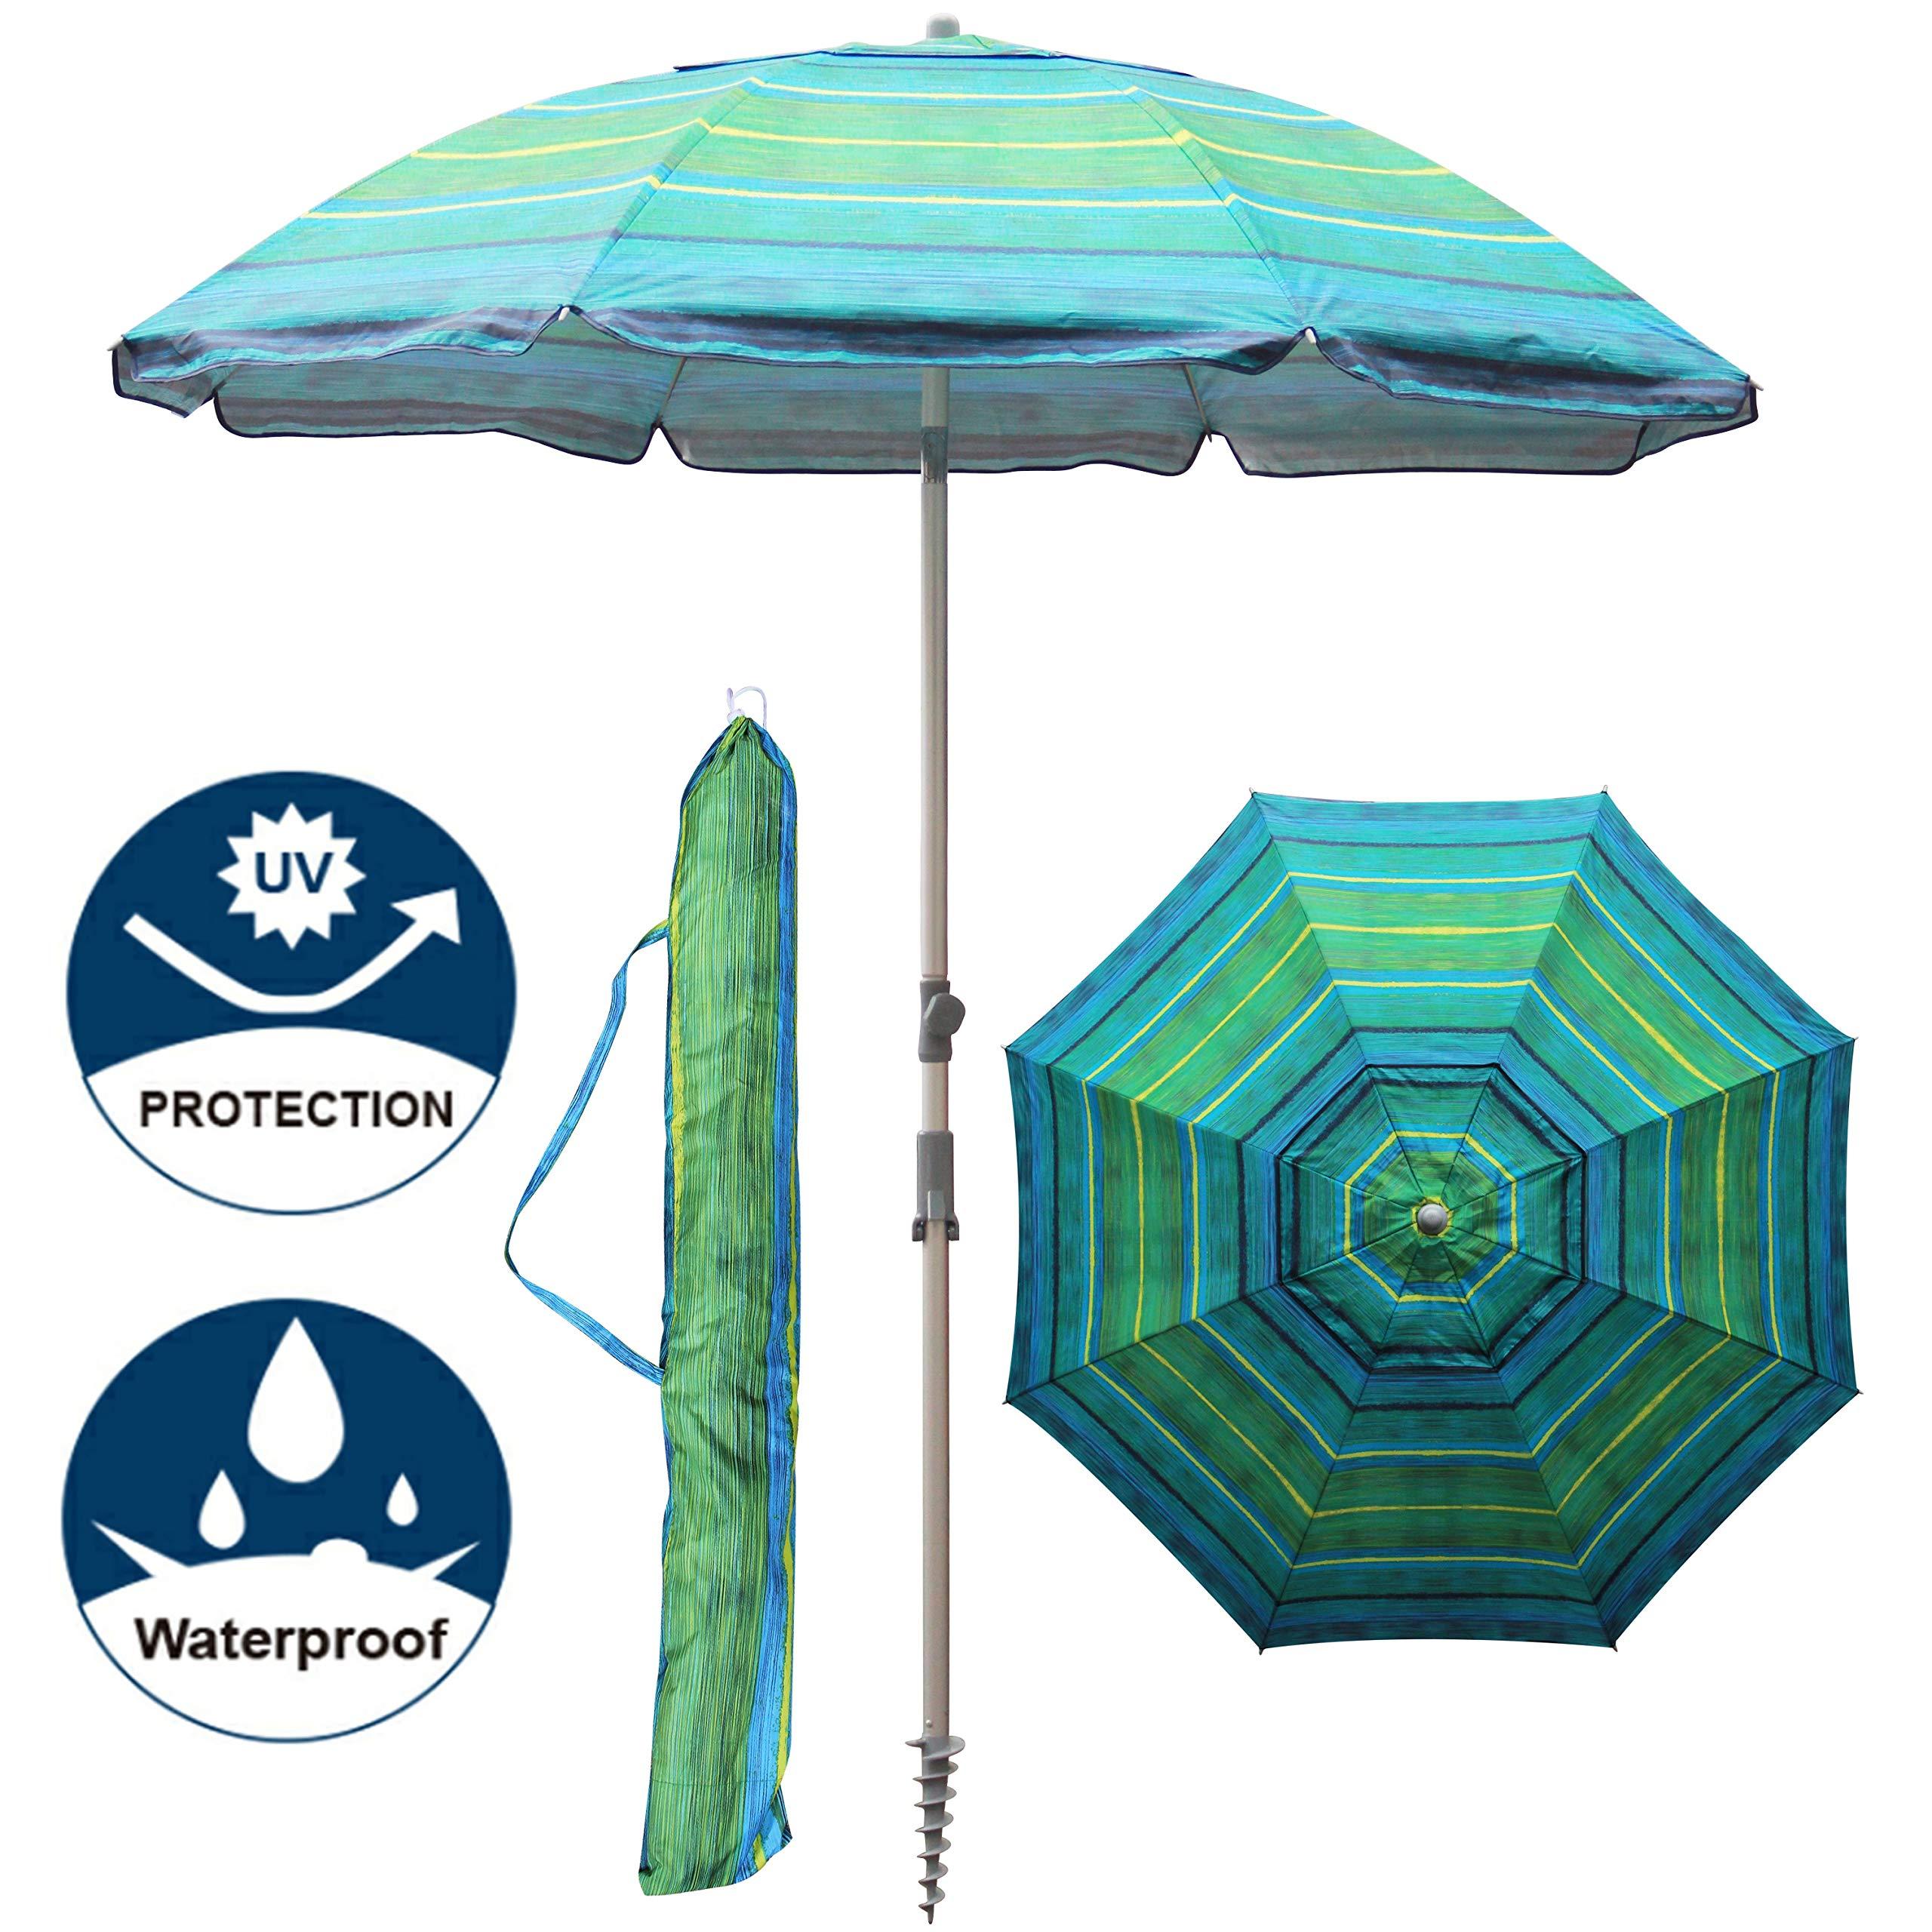 Blissun 7.2' Portable Beach Umbrella with Sand Anchor, Tilt Pole, Carry Bag, Air Vent (Green Stripe) by Blissun